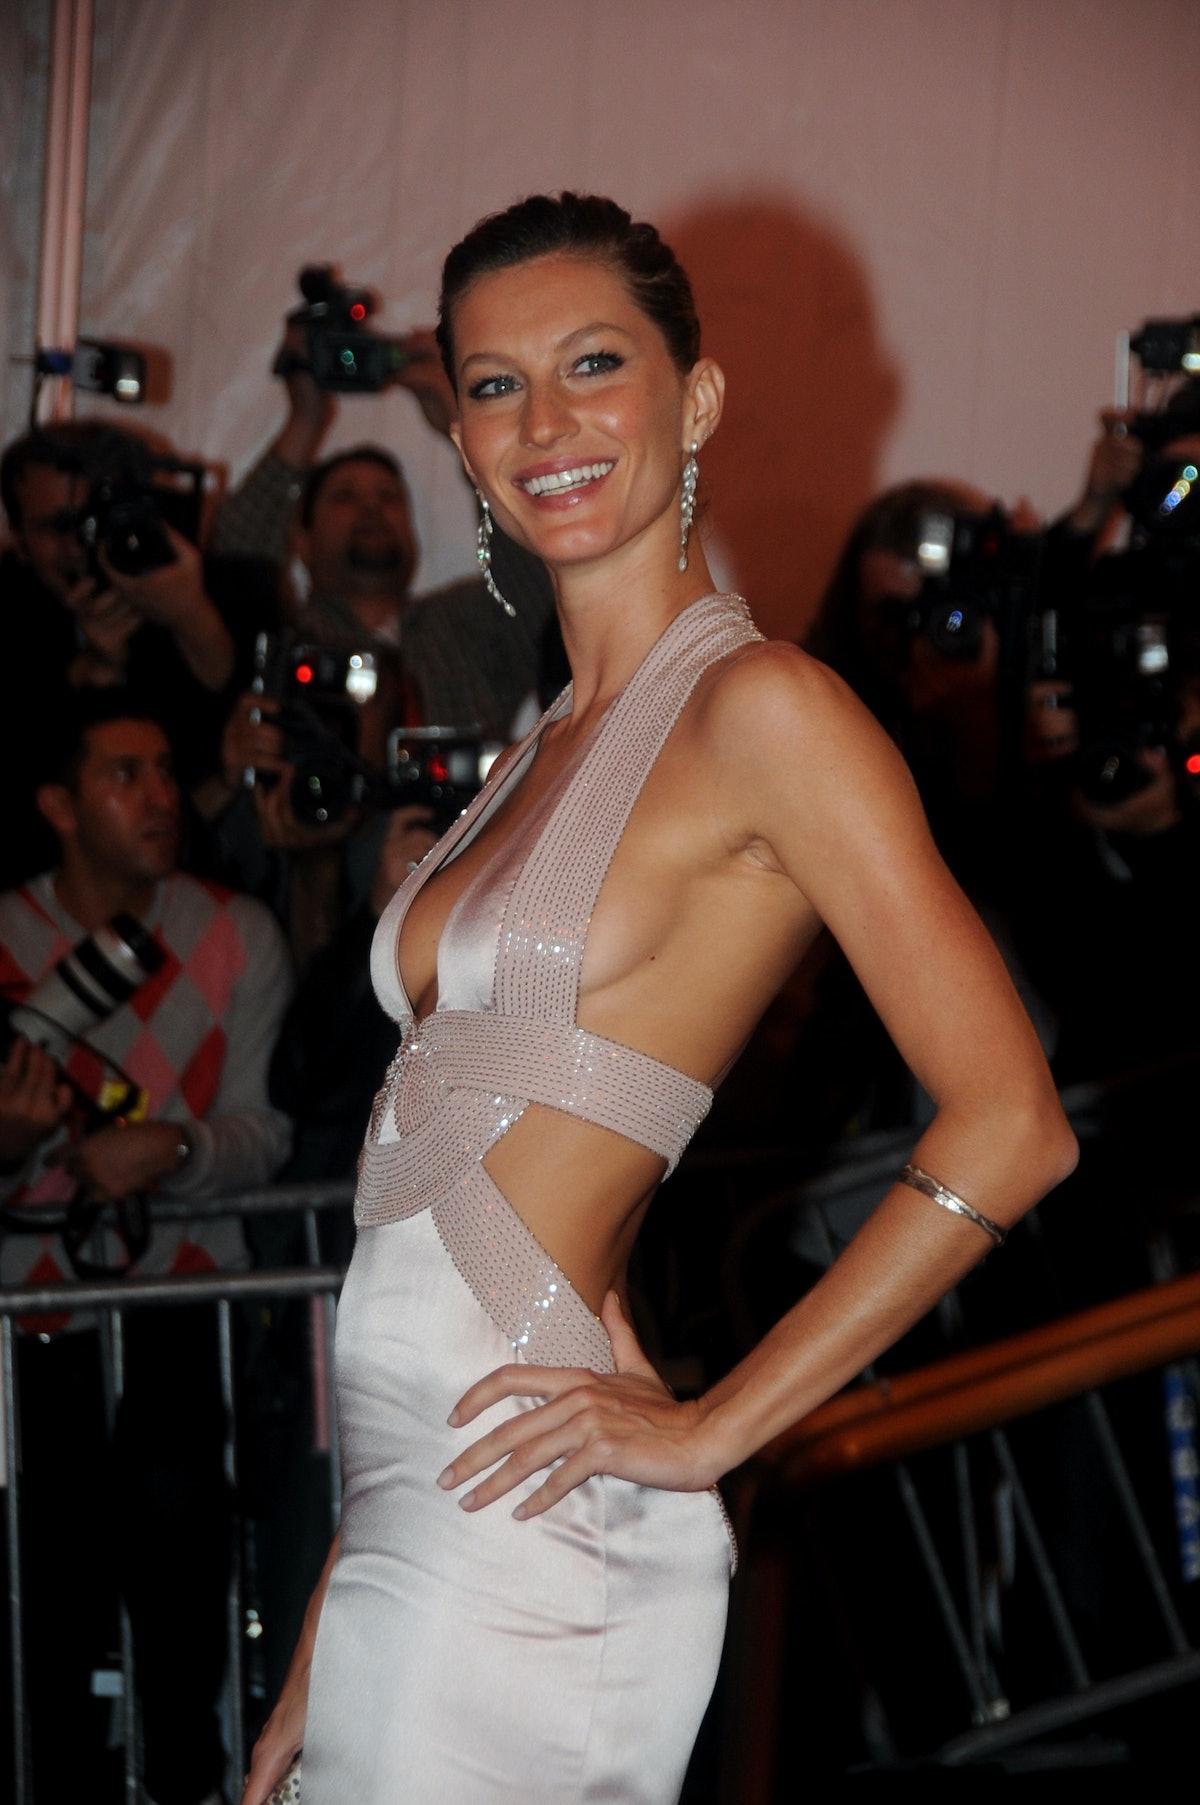 Gisele Bundchen at the Costume Institute Gala celebrating Su